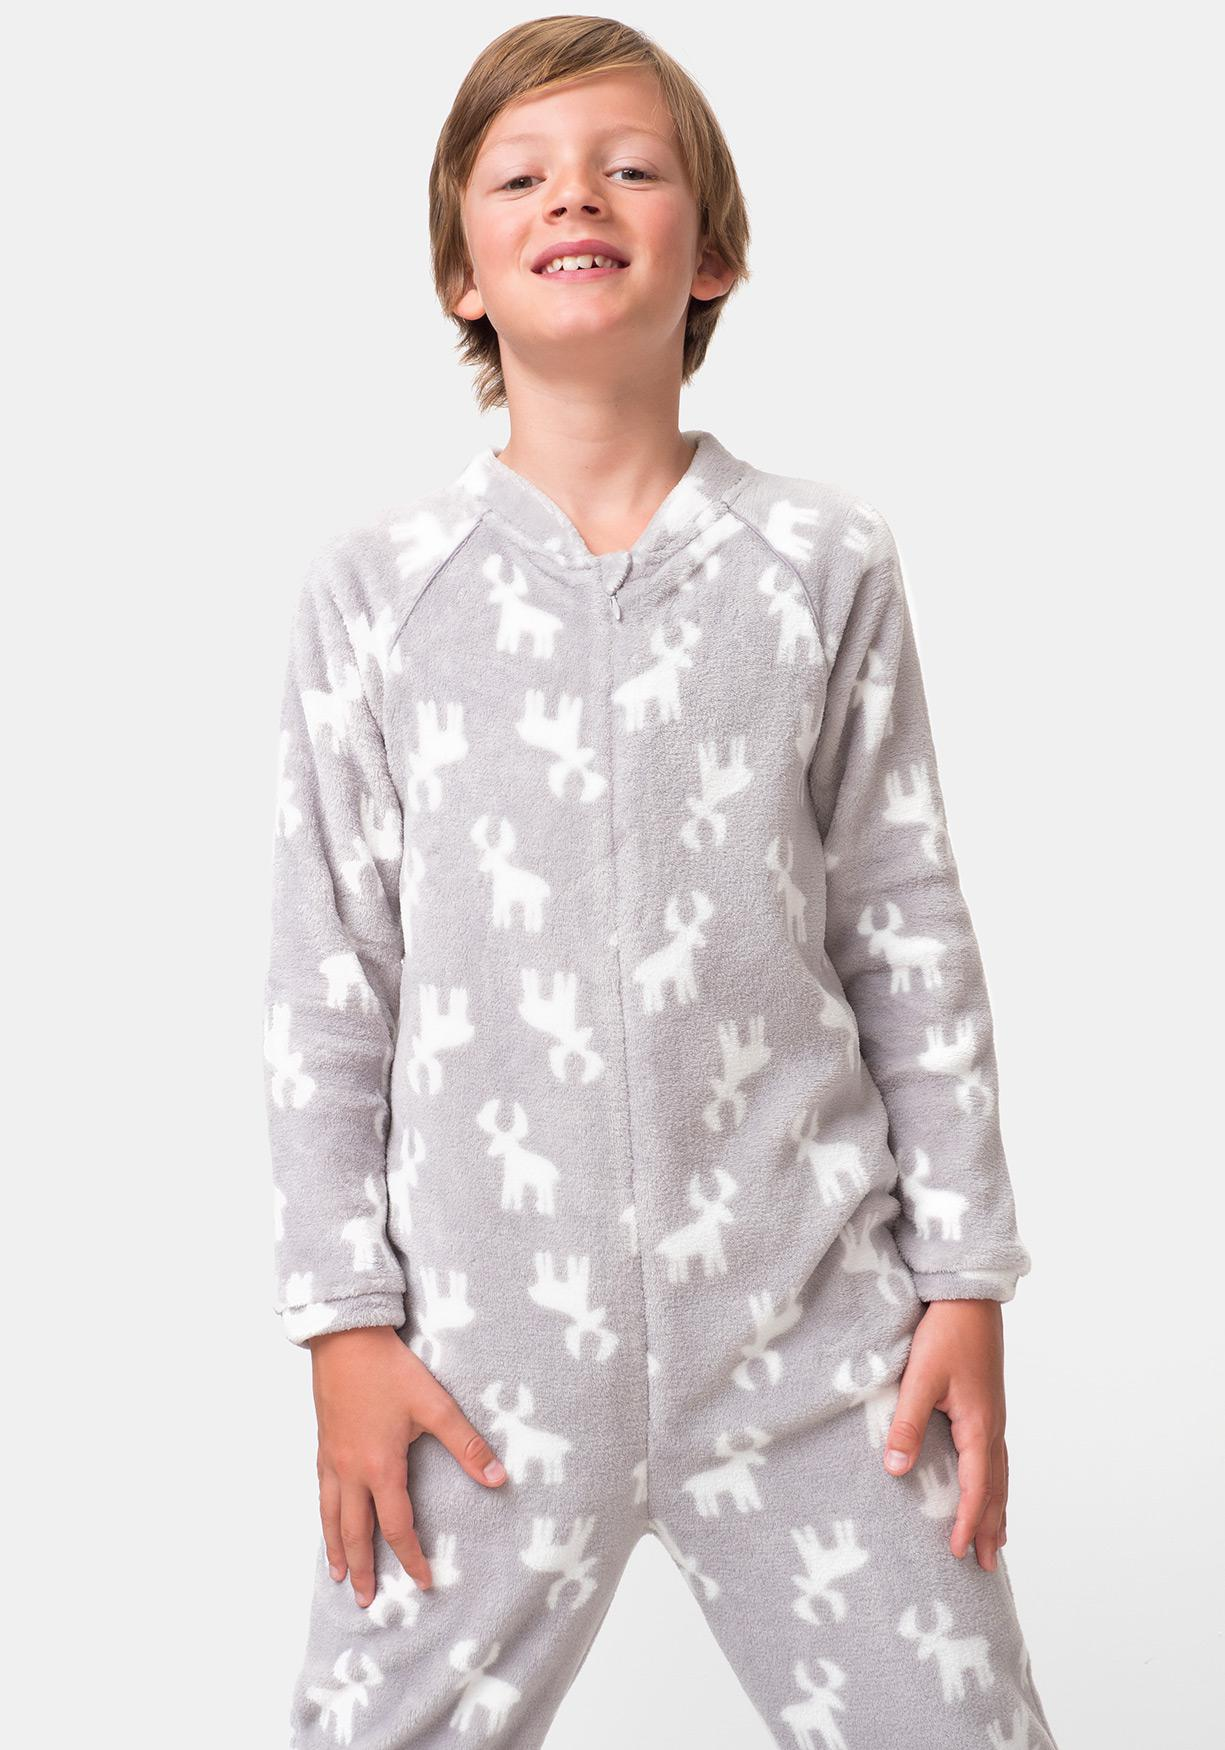 b43bdcd93 Comprar Pijama manta micro polar printeado TEX. ¡Aprovéchate de ...